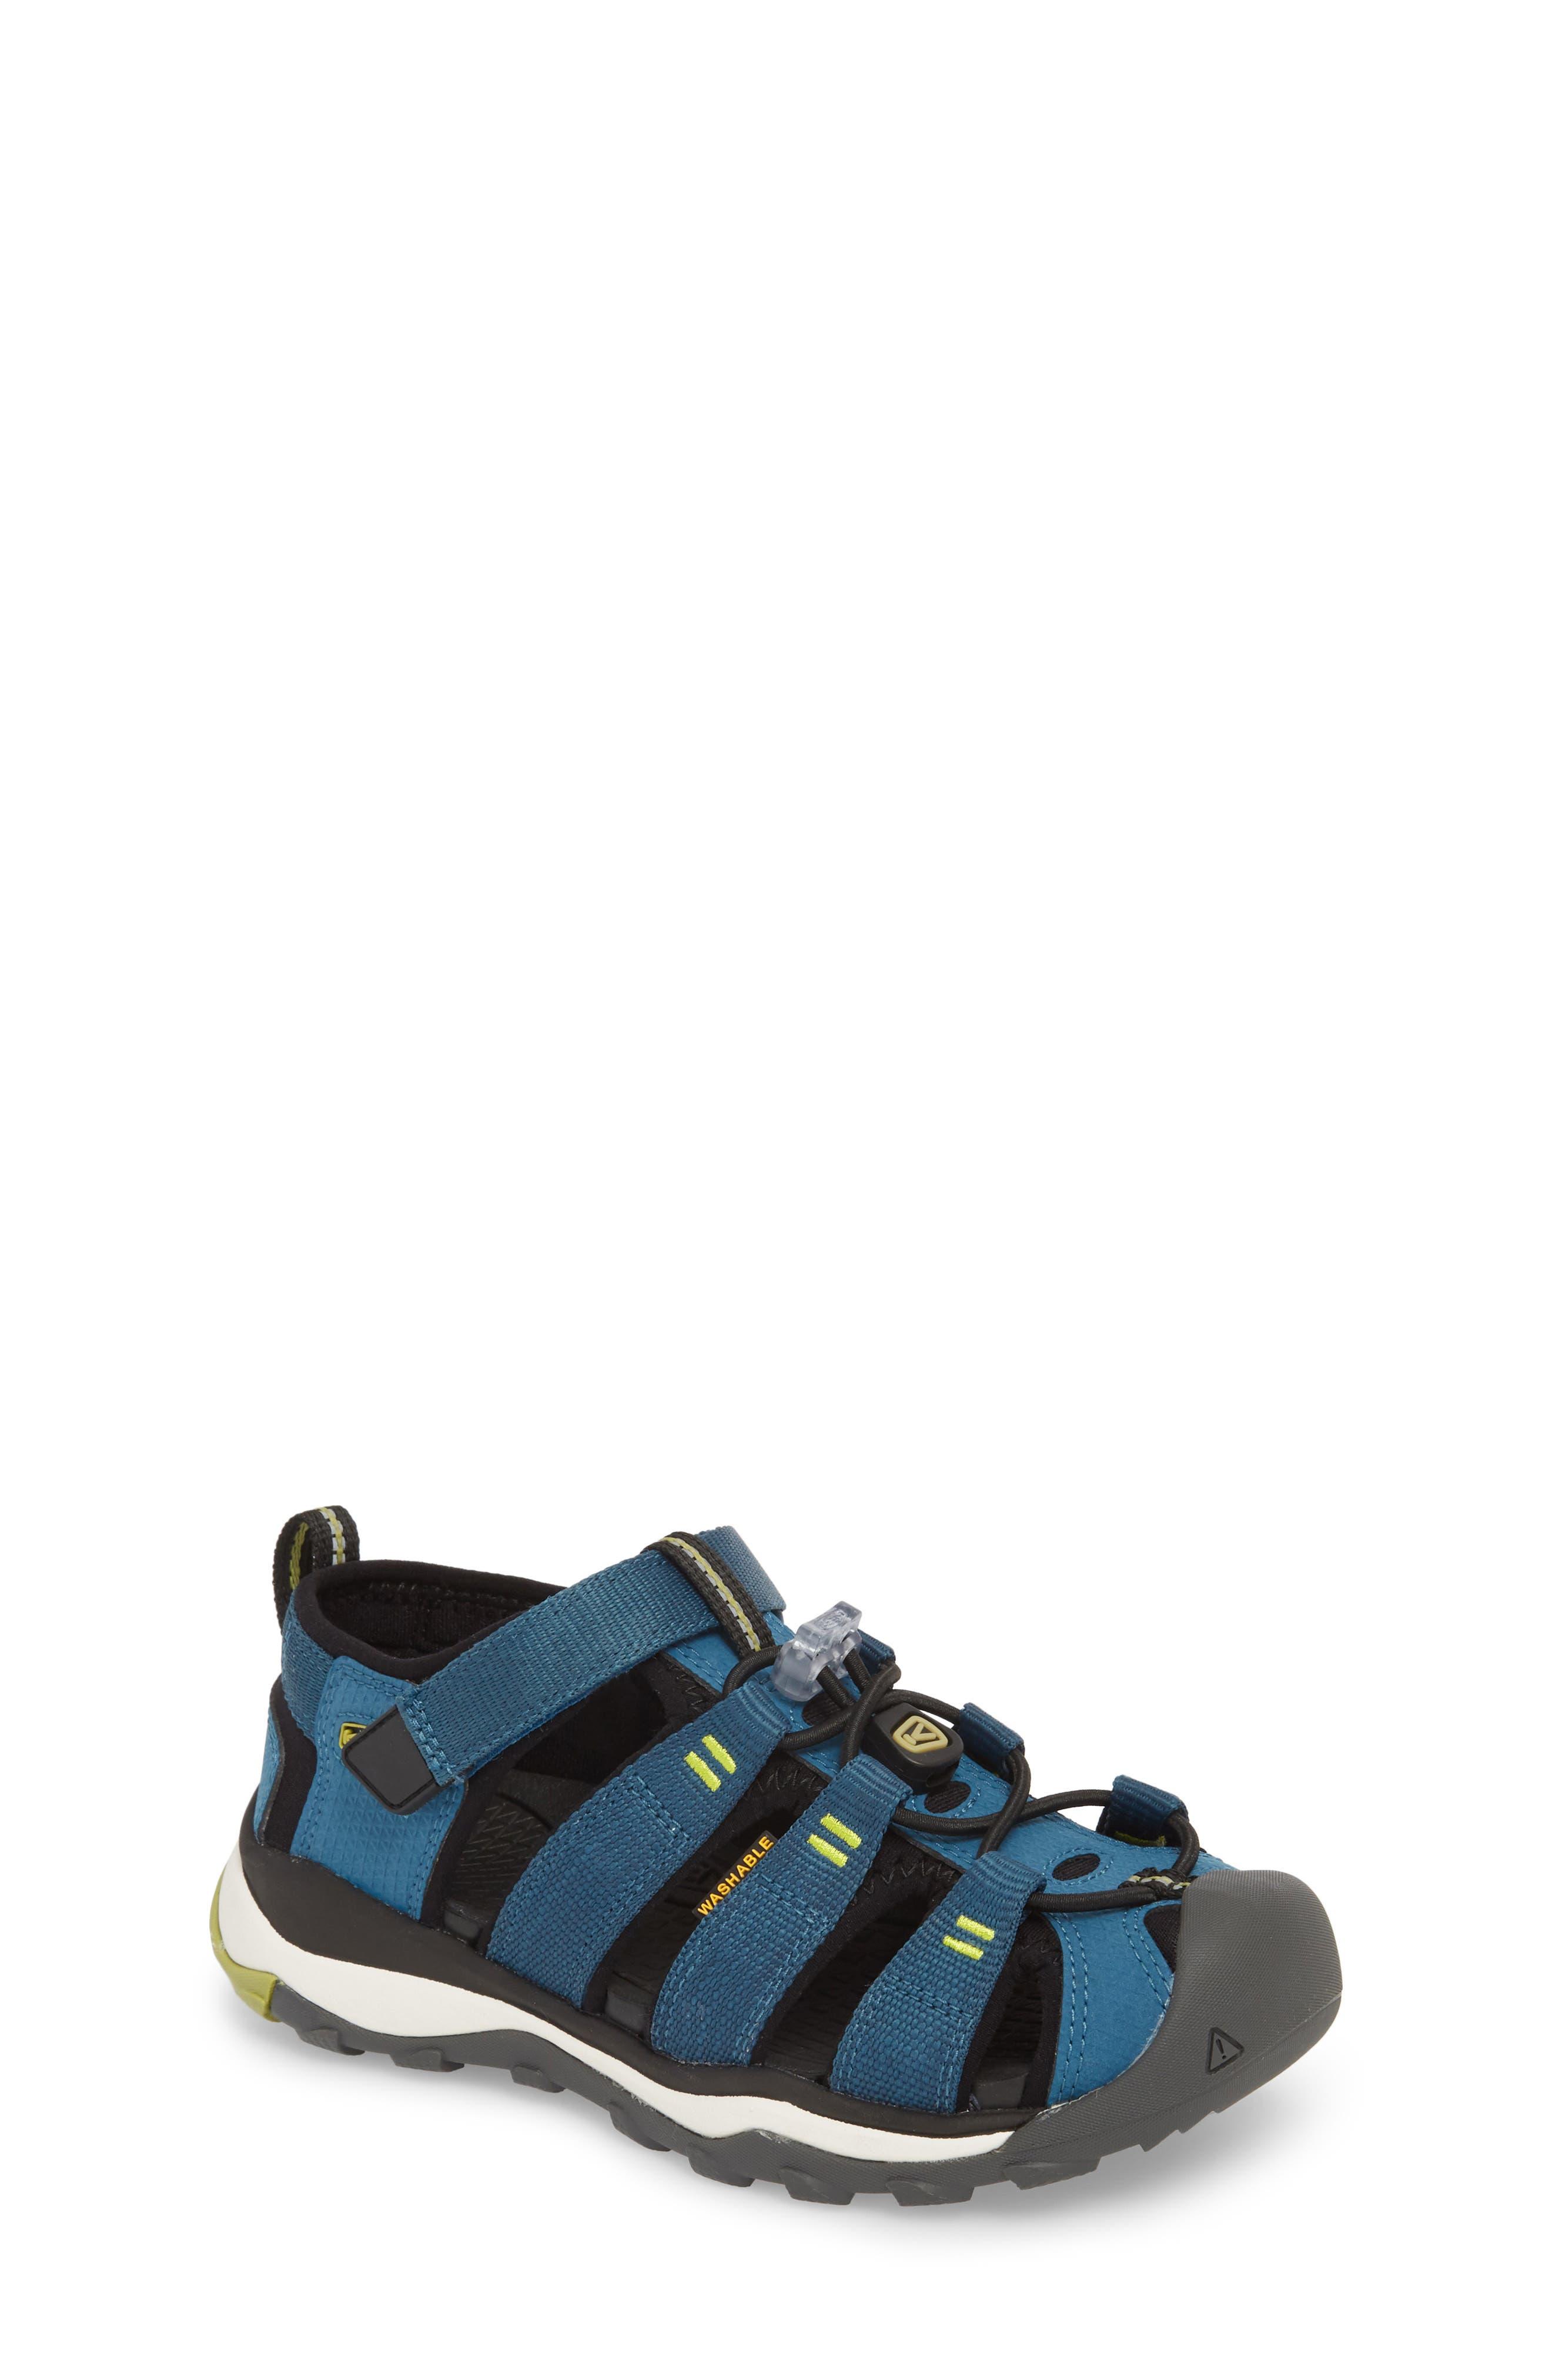 Newport Neo H2 Water Friendly Sandal,                         Main,                         color, LEGION BLUE/ MOSS